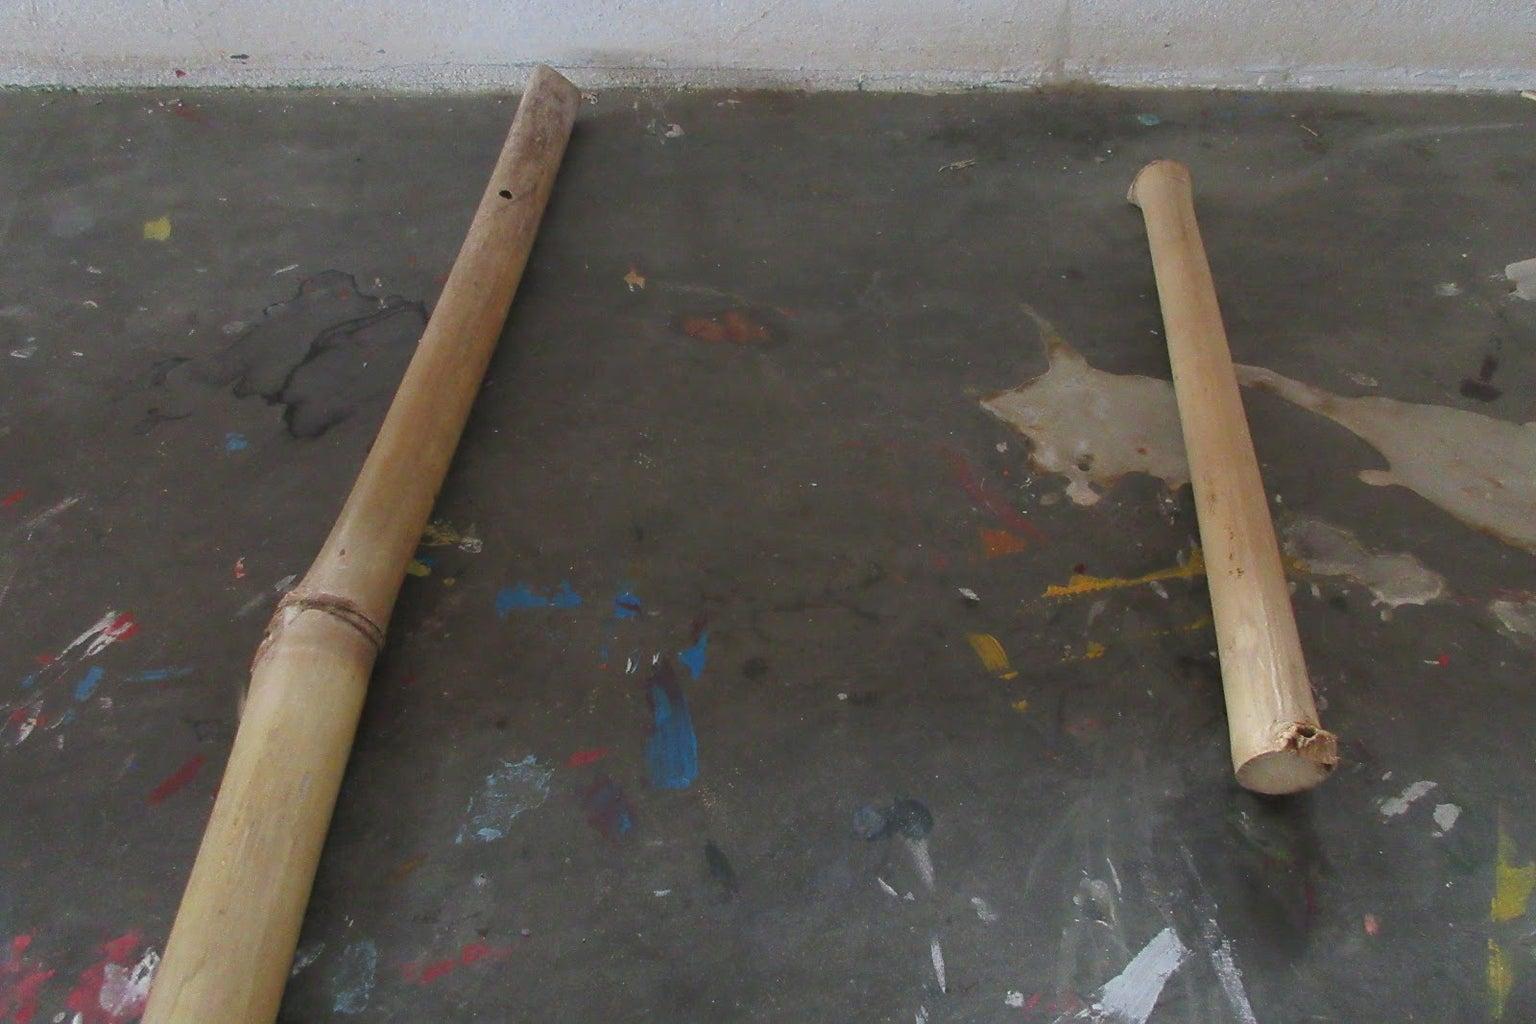 Getting Your Bamboo Ready | រៀបចំឫស្សីរបស់អ្នក